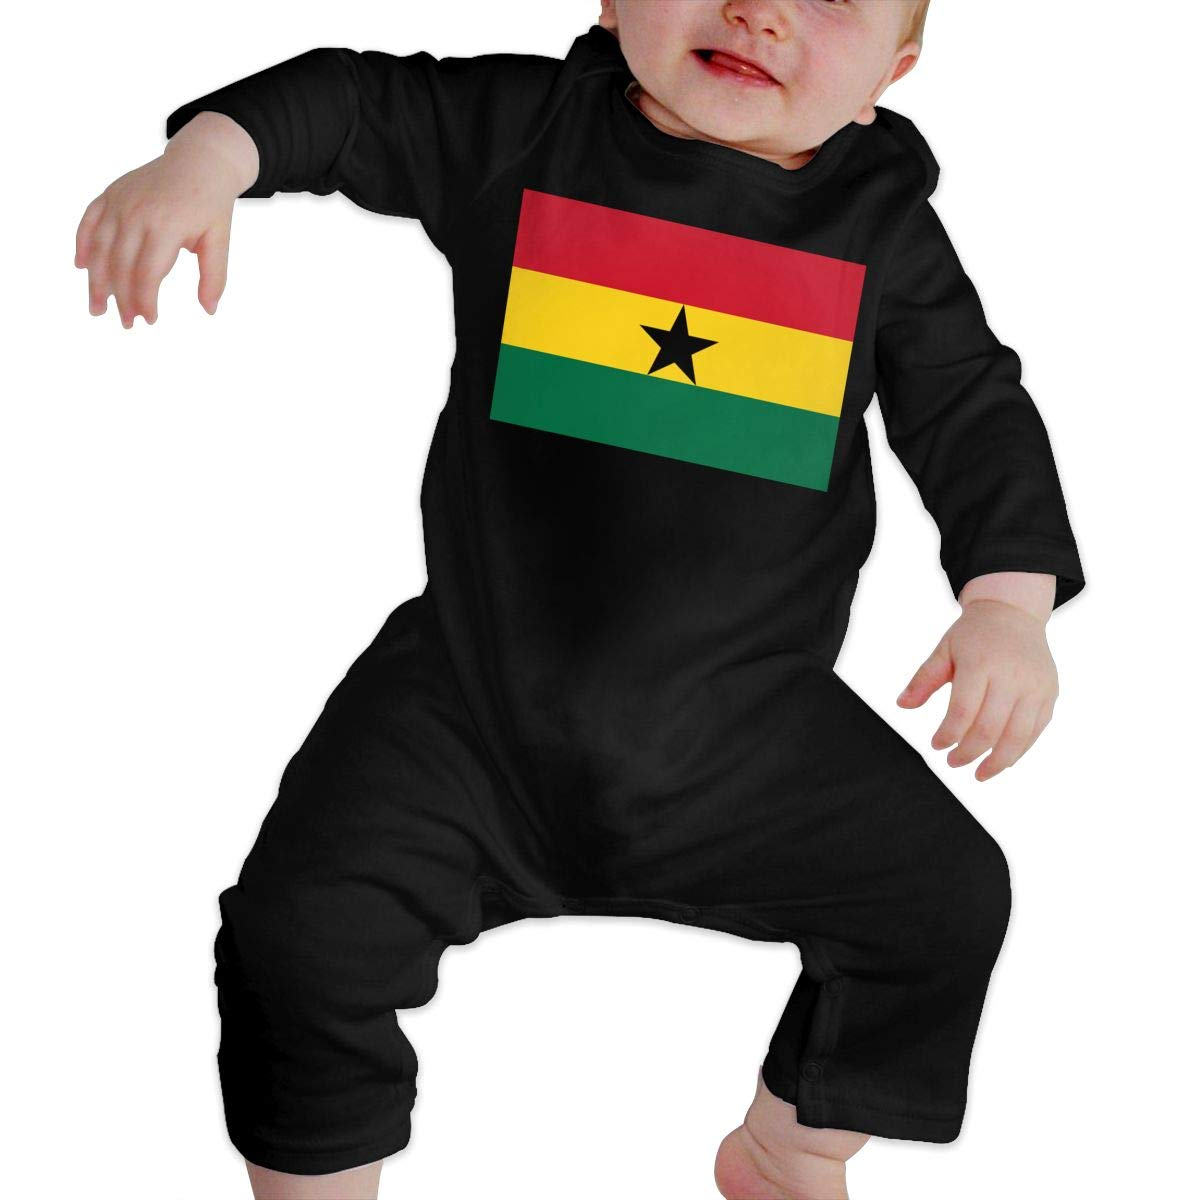 Soft Ghana Flag Sleepwear U99oi-9 Long Sleeve Cotton Bodysuit for Baby Boys and Girls